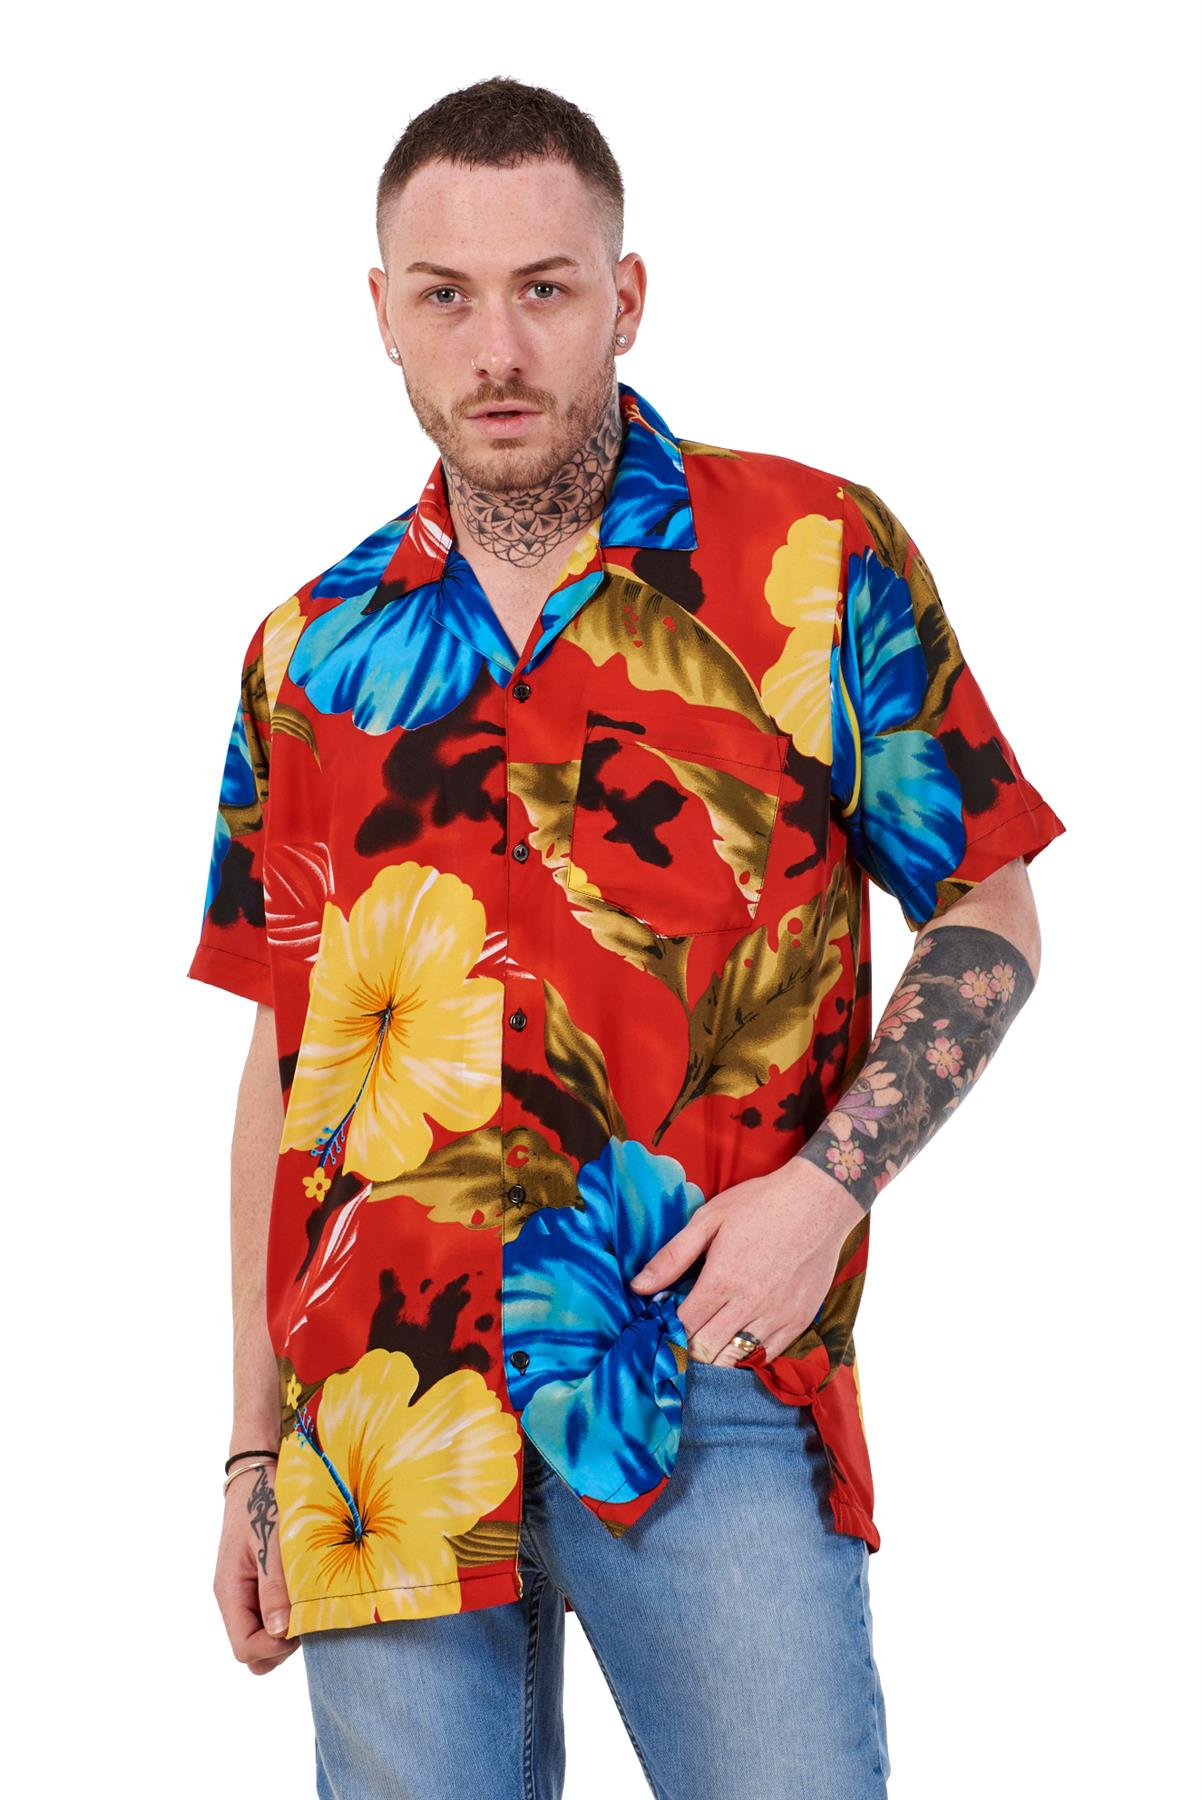 Mens-Hawaiian-Shirt-Multi-Colors-Print-Regular-Big-Size-Summer-Fancy-Dress-M-5XL thumbnail 35